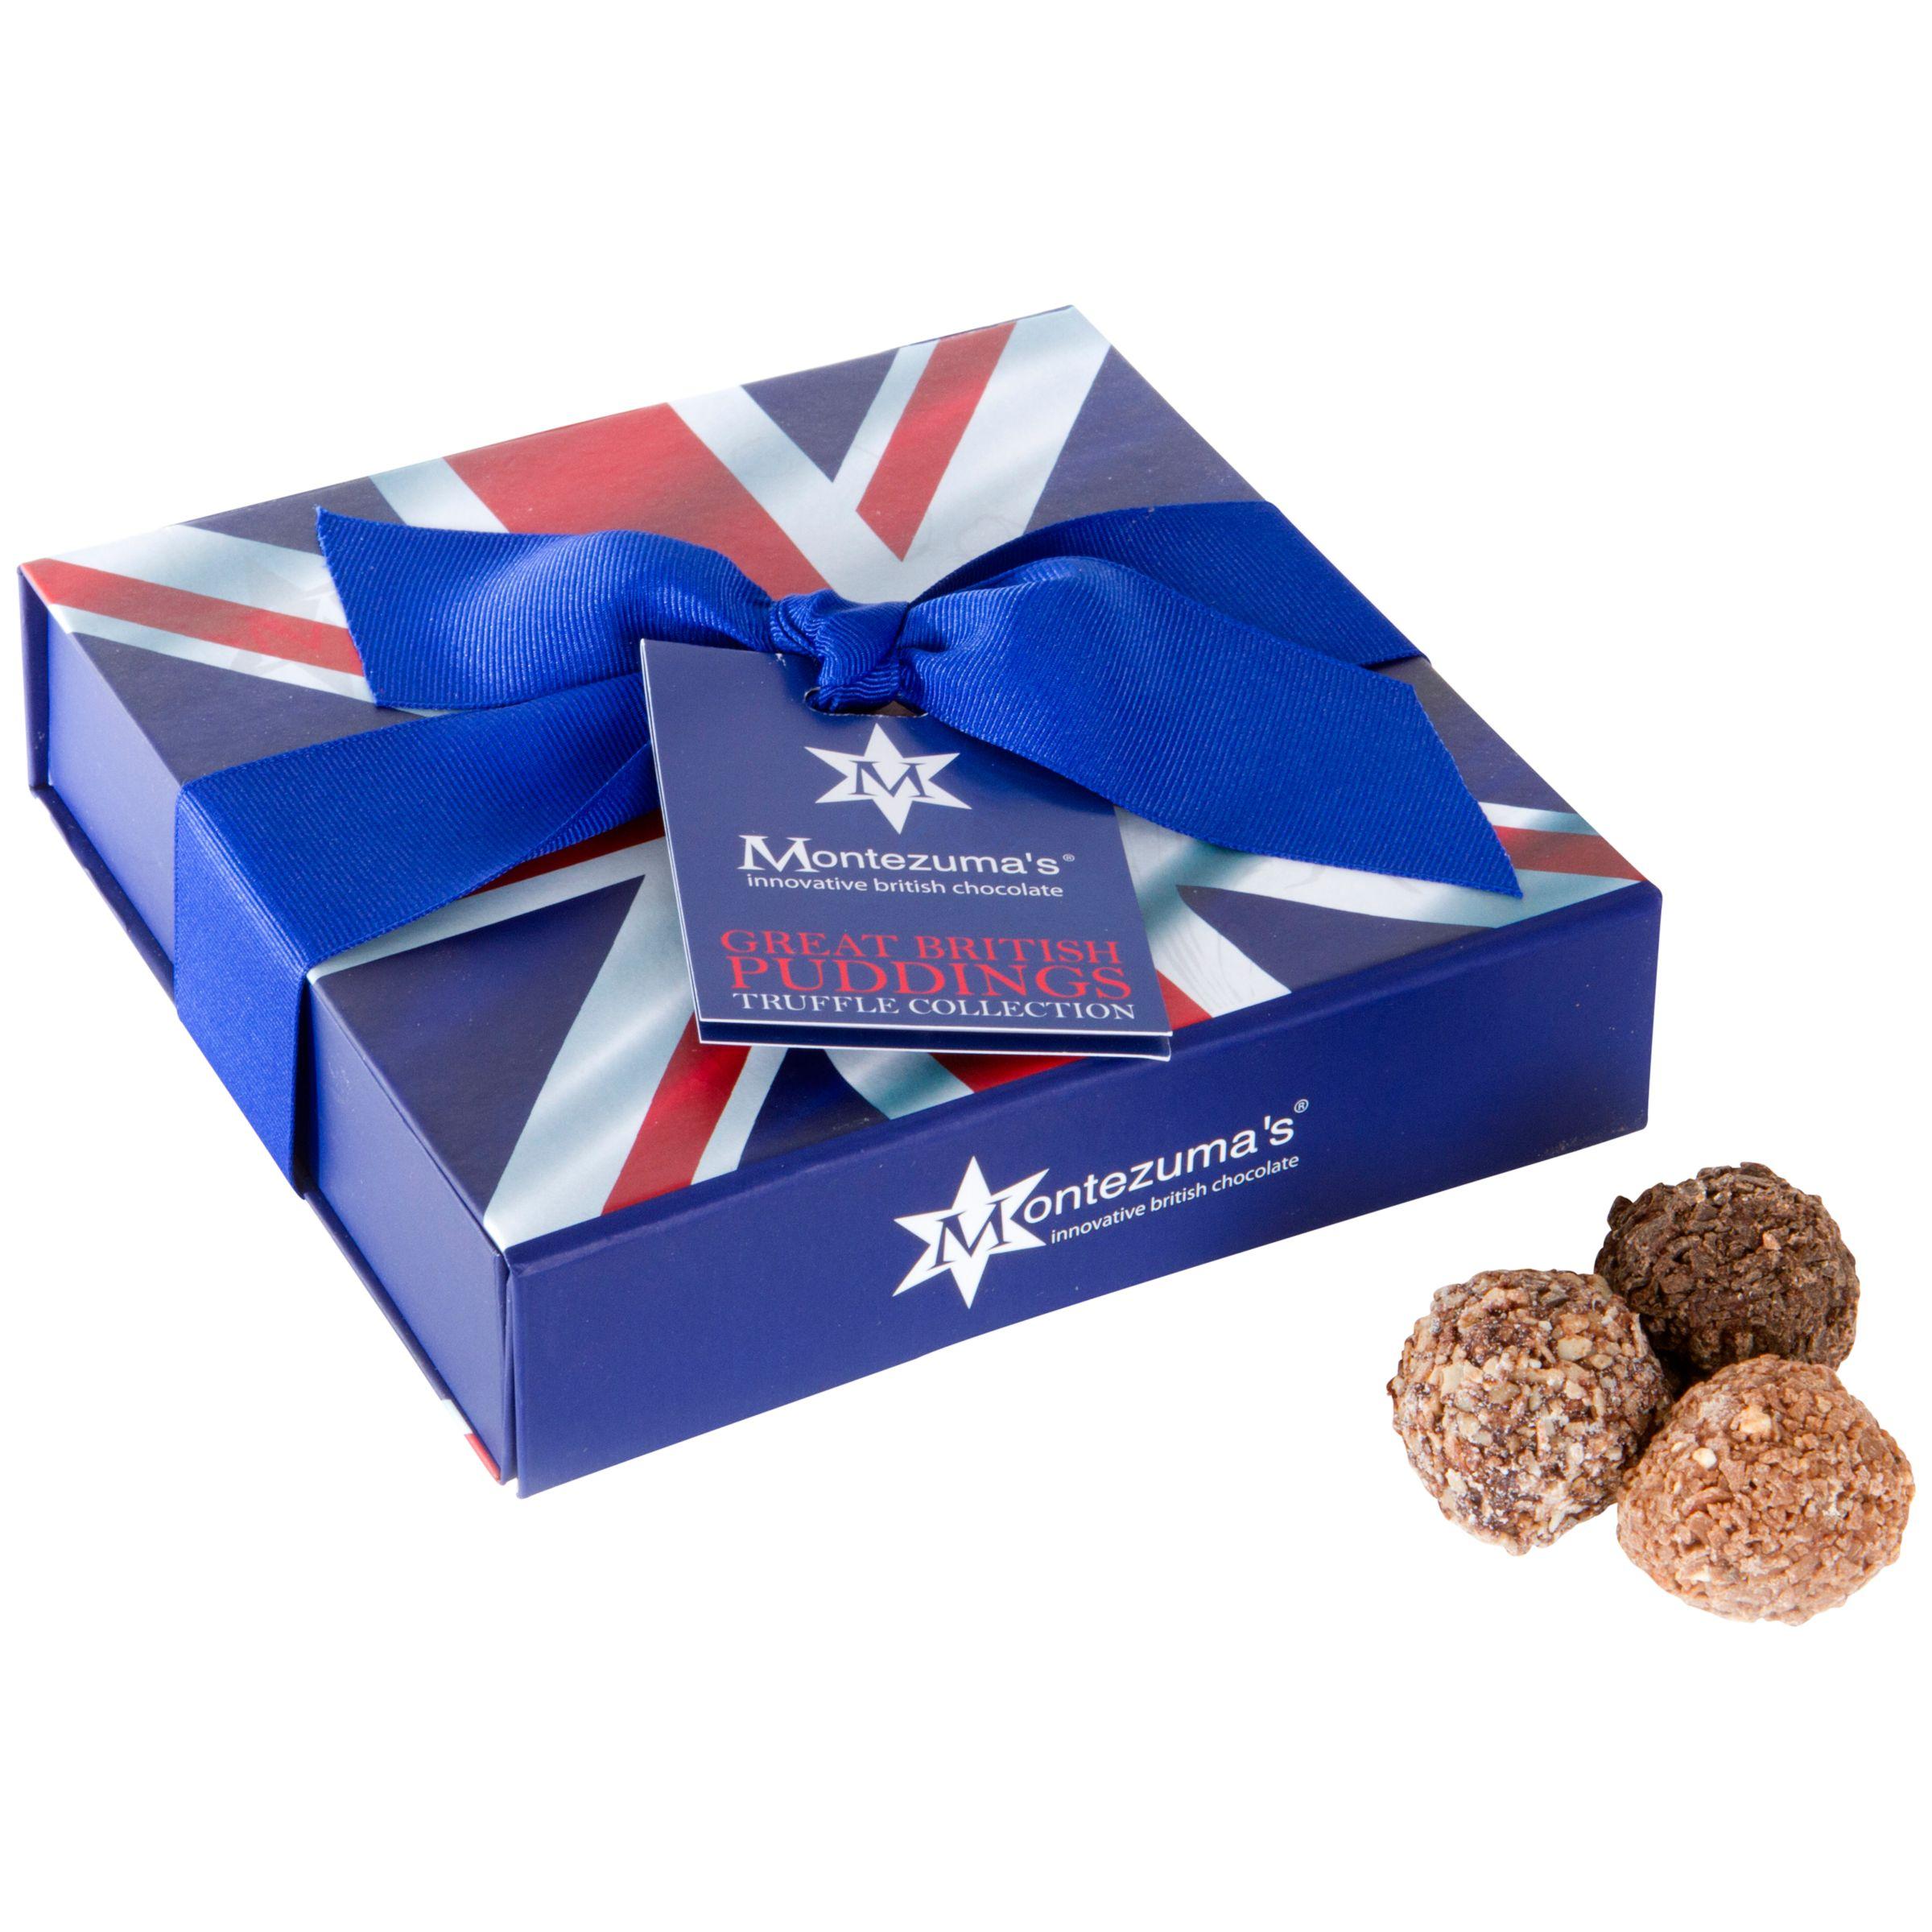 Montezuma's Montezuma's Truffles in a Union Jack Box, 210g